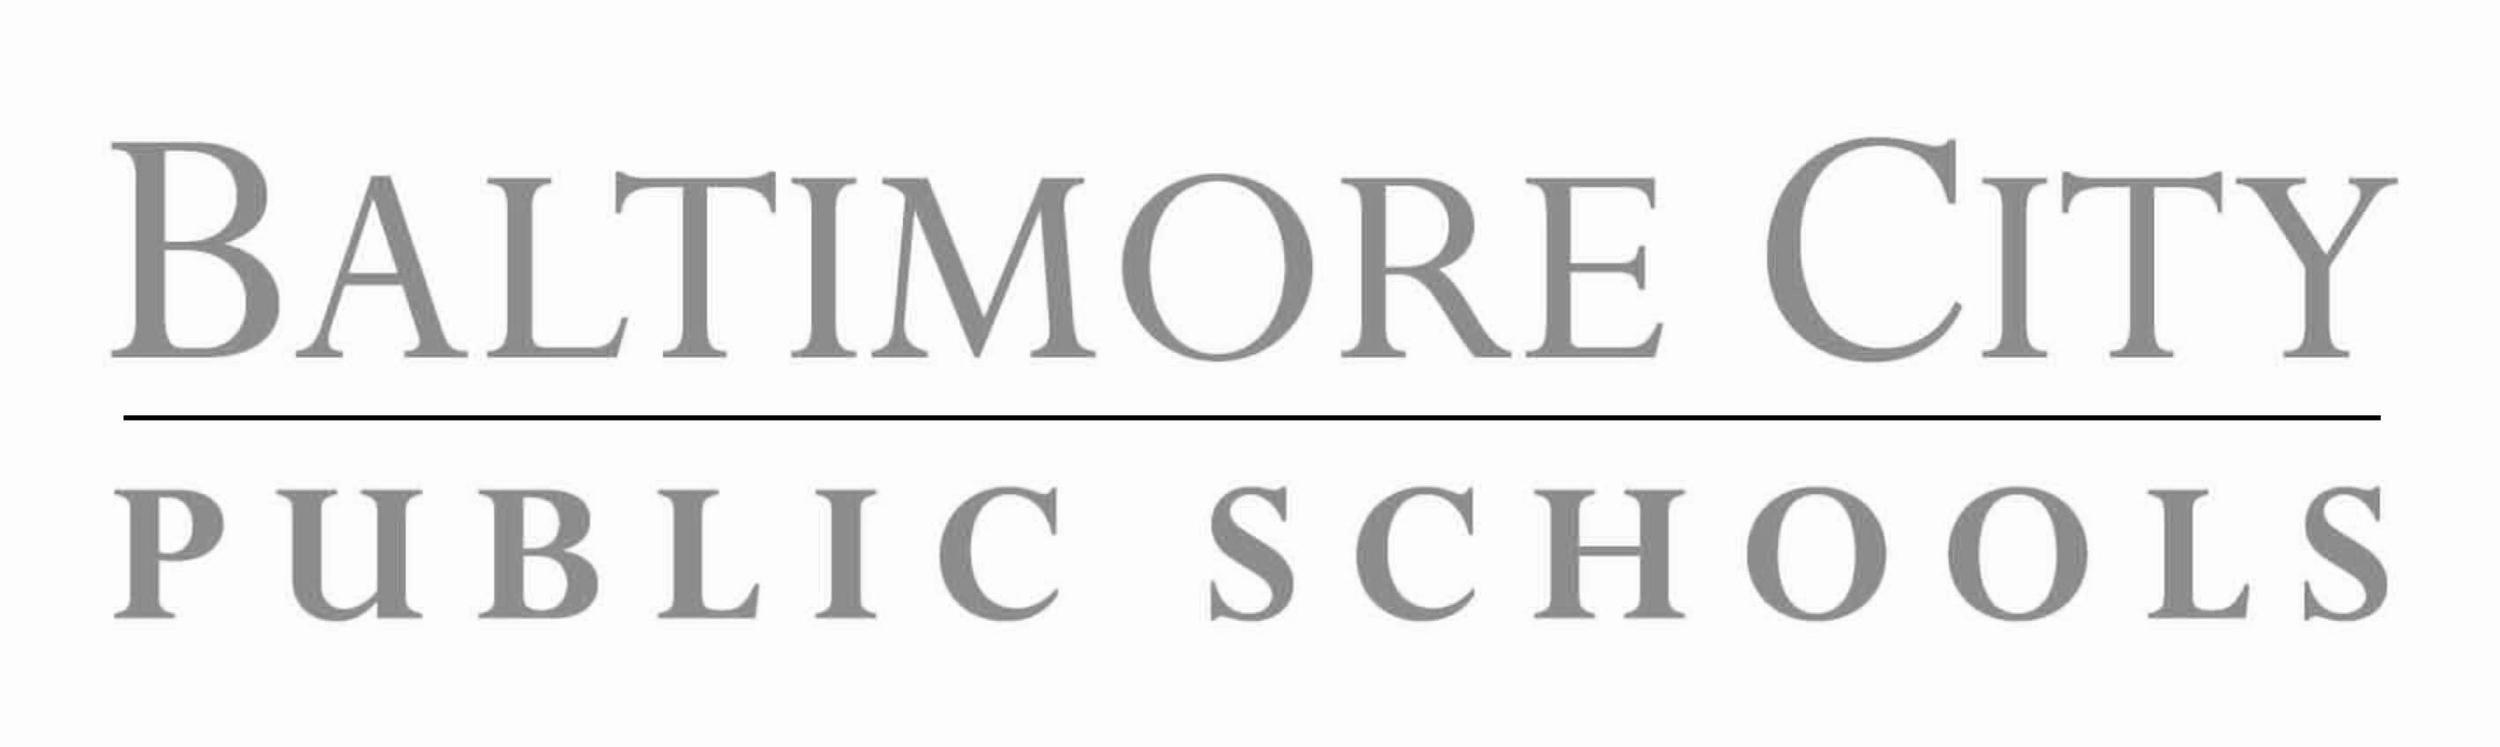 Baltimore City Public Schools.jpg